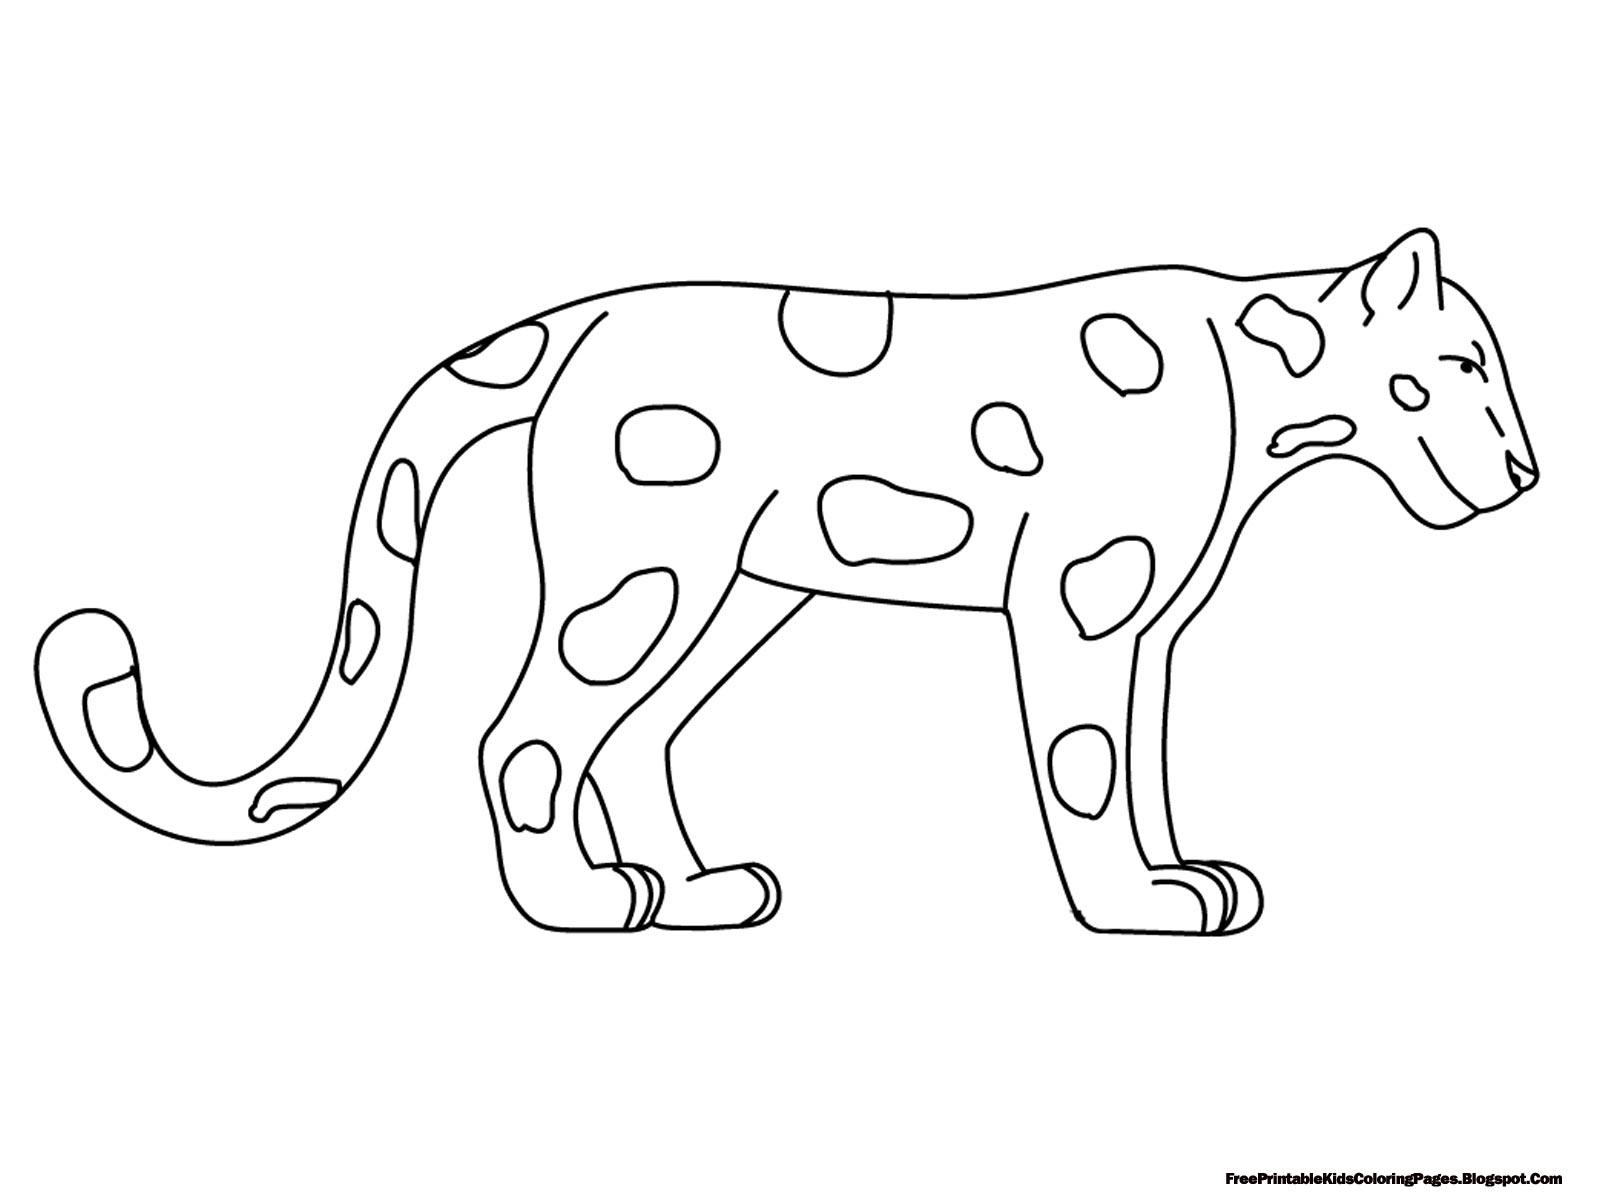 Jaguar Coloring Pages - Free Printable Kids Coloring Pages ...